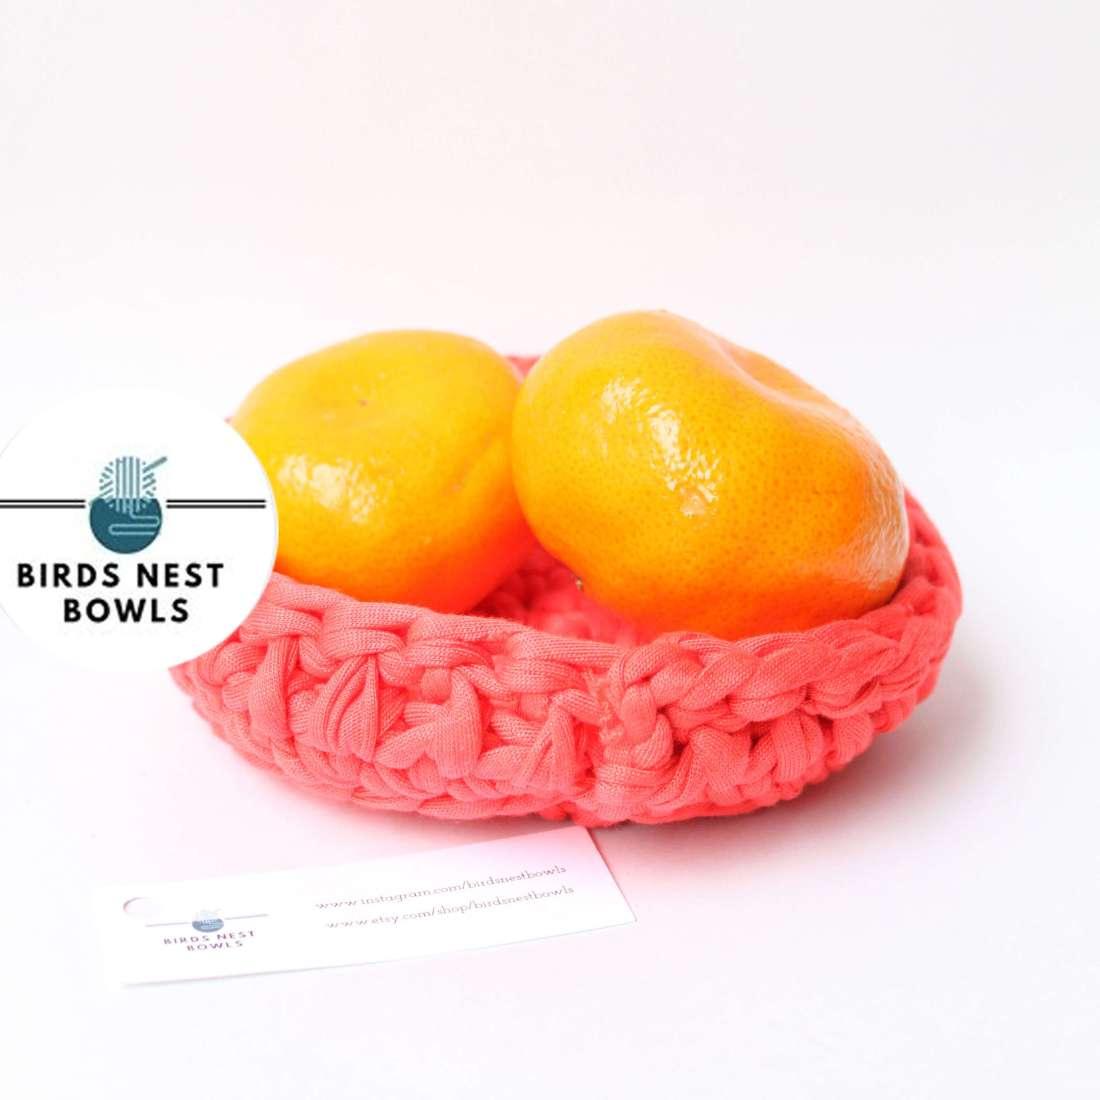 Birds Nest Bowls - Crocheted multi function bowl